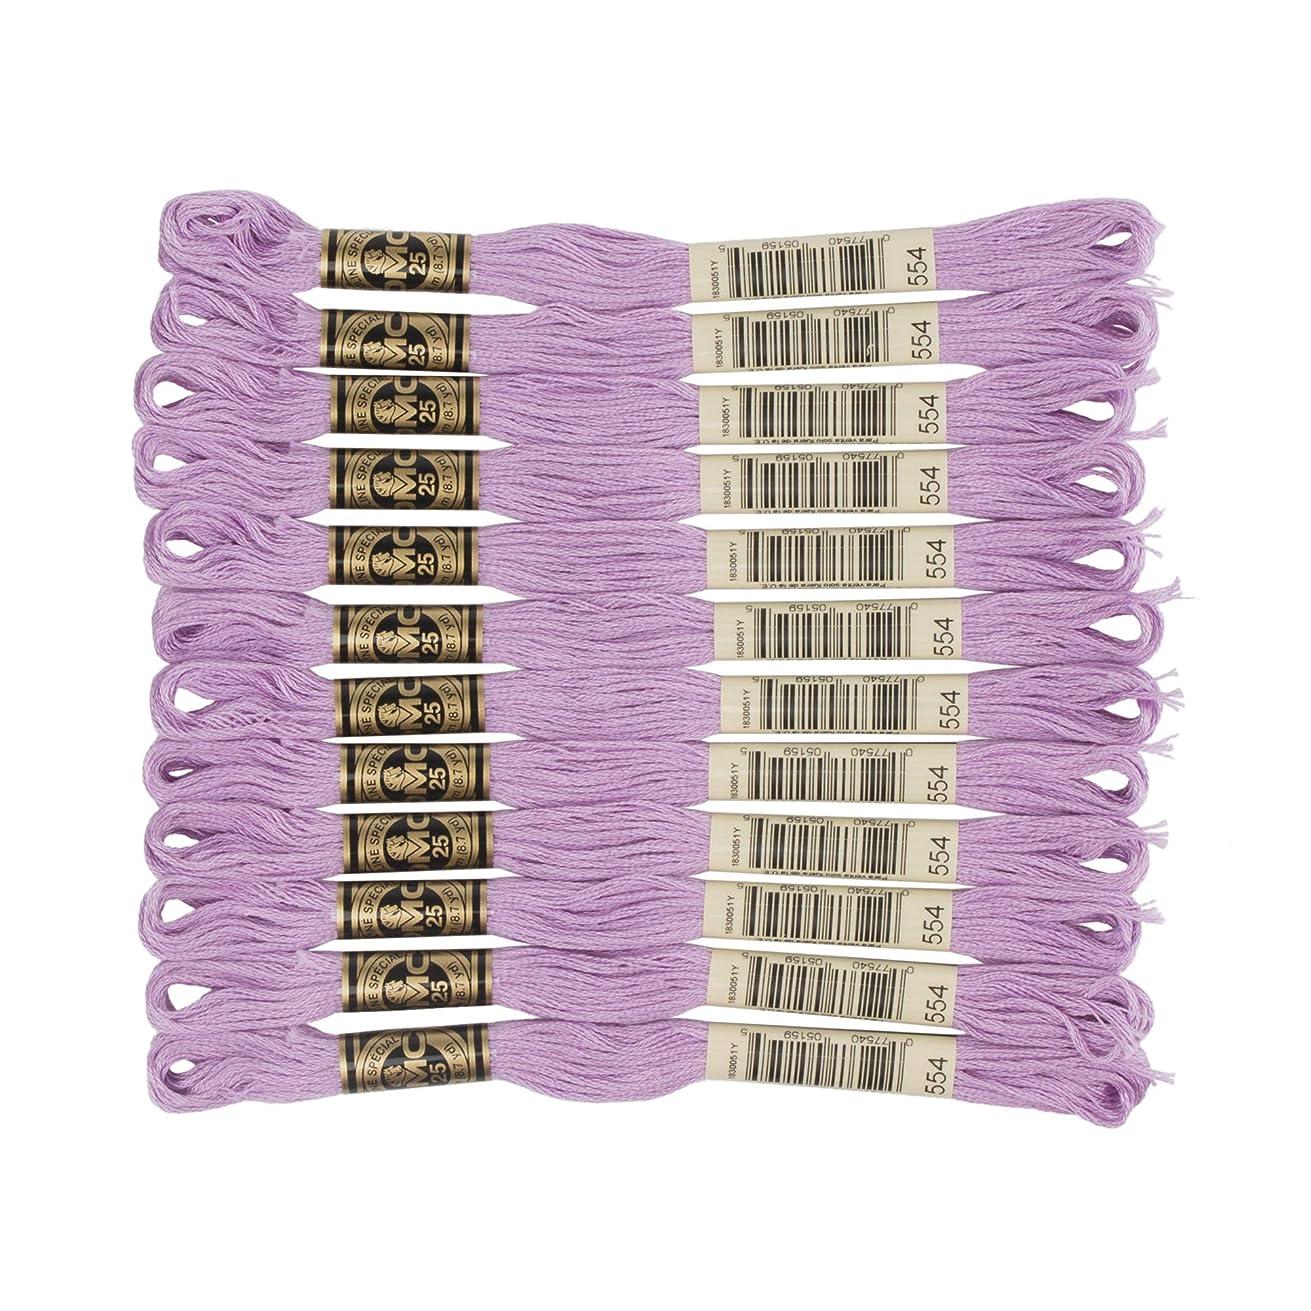 DMC 6-Strand Embroidery Cotton Floss, Light Violet